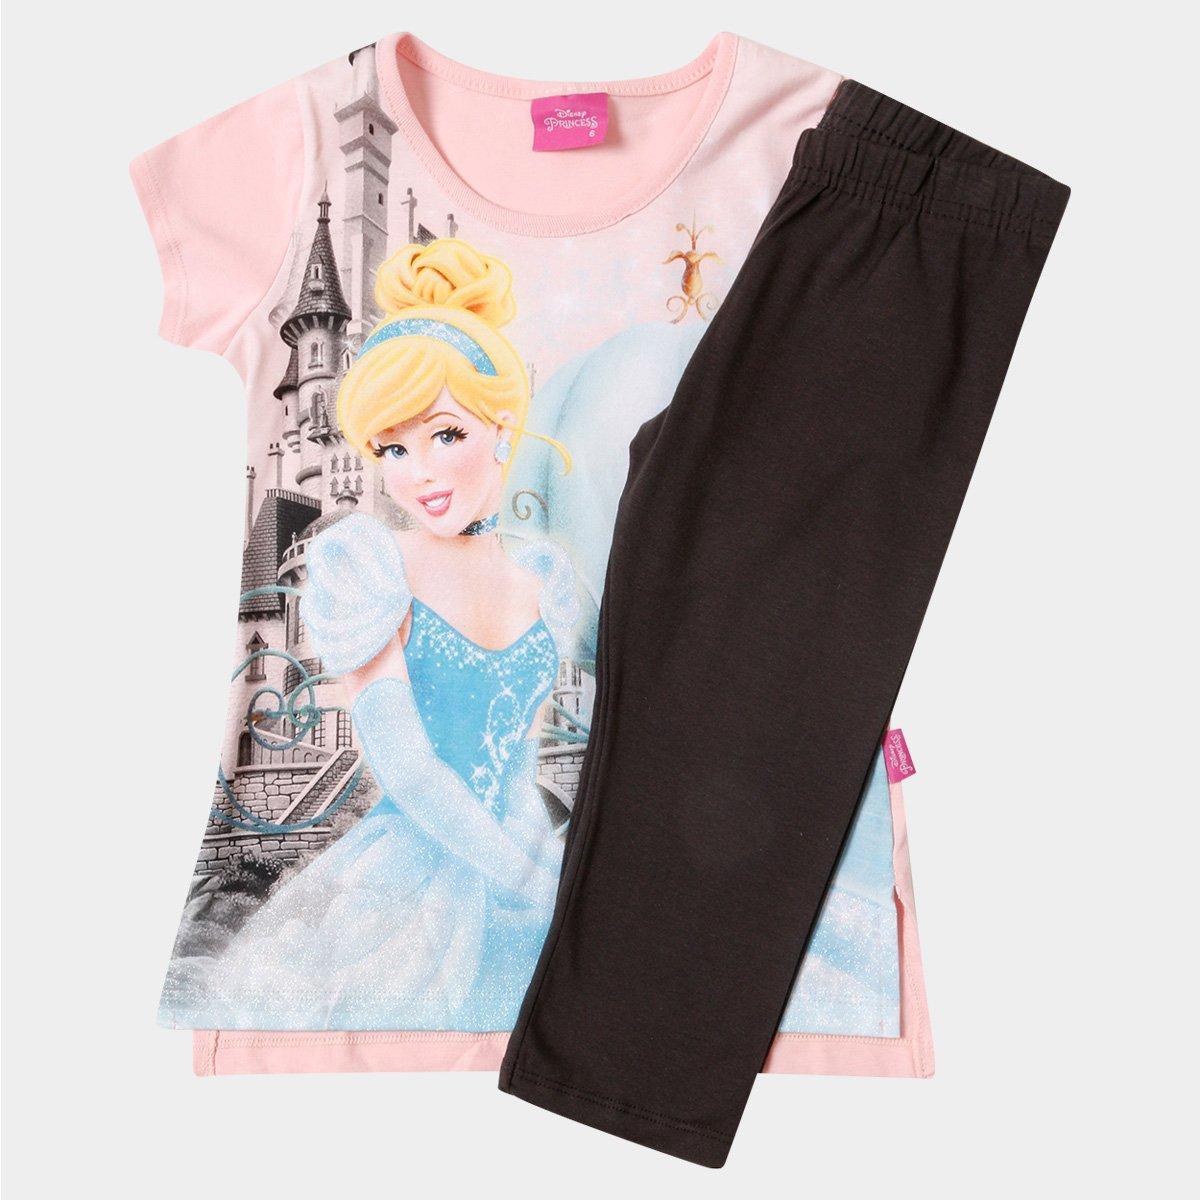 5088d4f07 Conjunto Brandili Princesas - Compre Agora